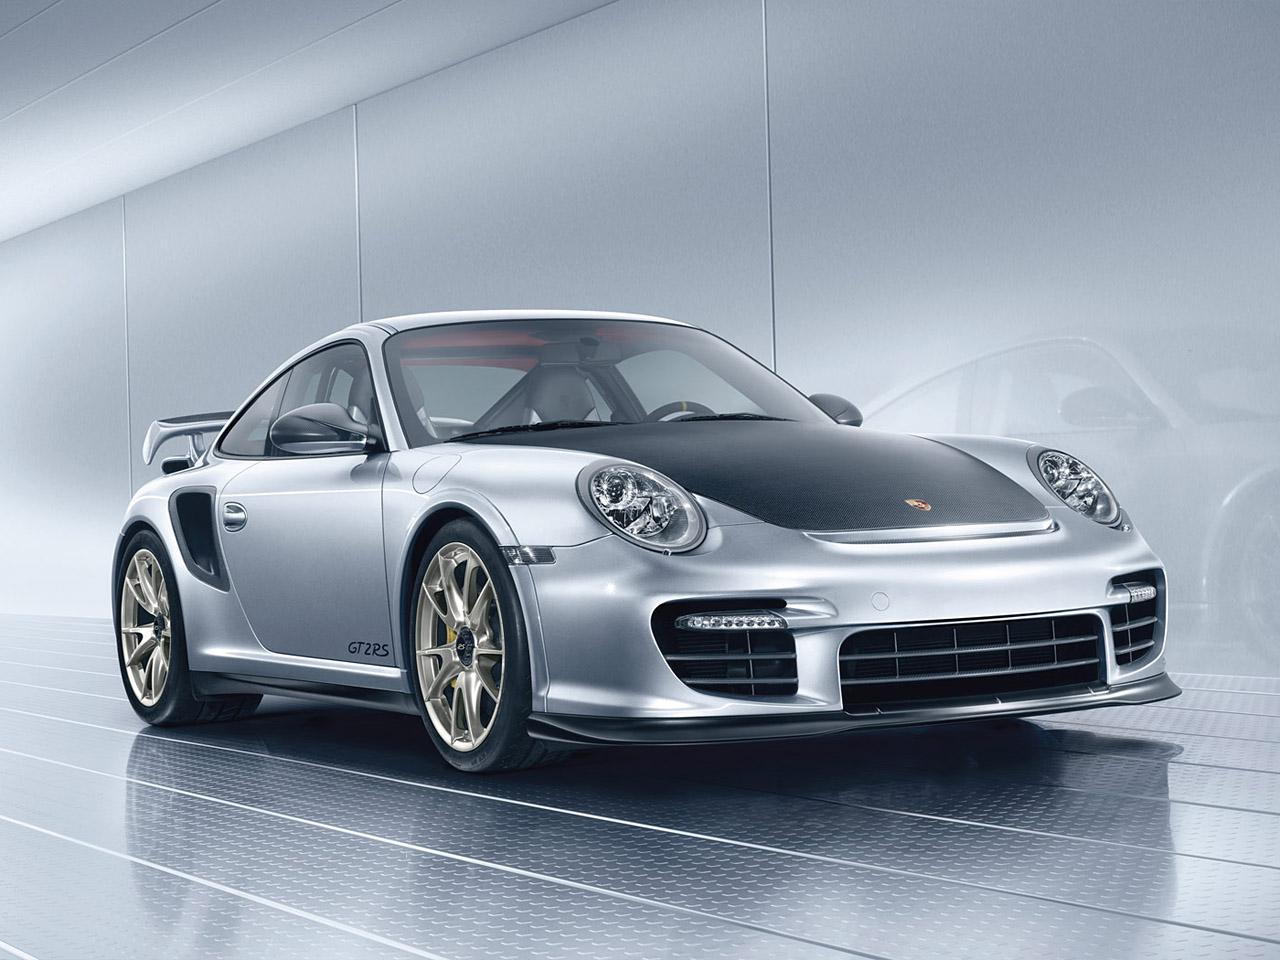 2011 twin turbo porsche 911 gt2 rs gambar wallpaper mobil. Black Bedroom Furniture Sets. Home Design Ideas